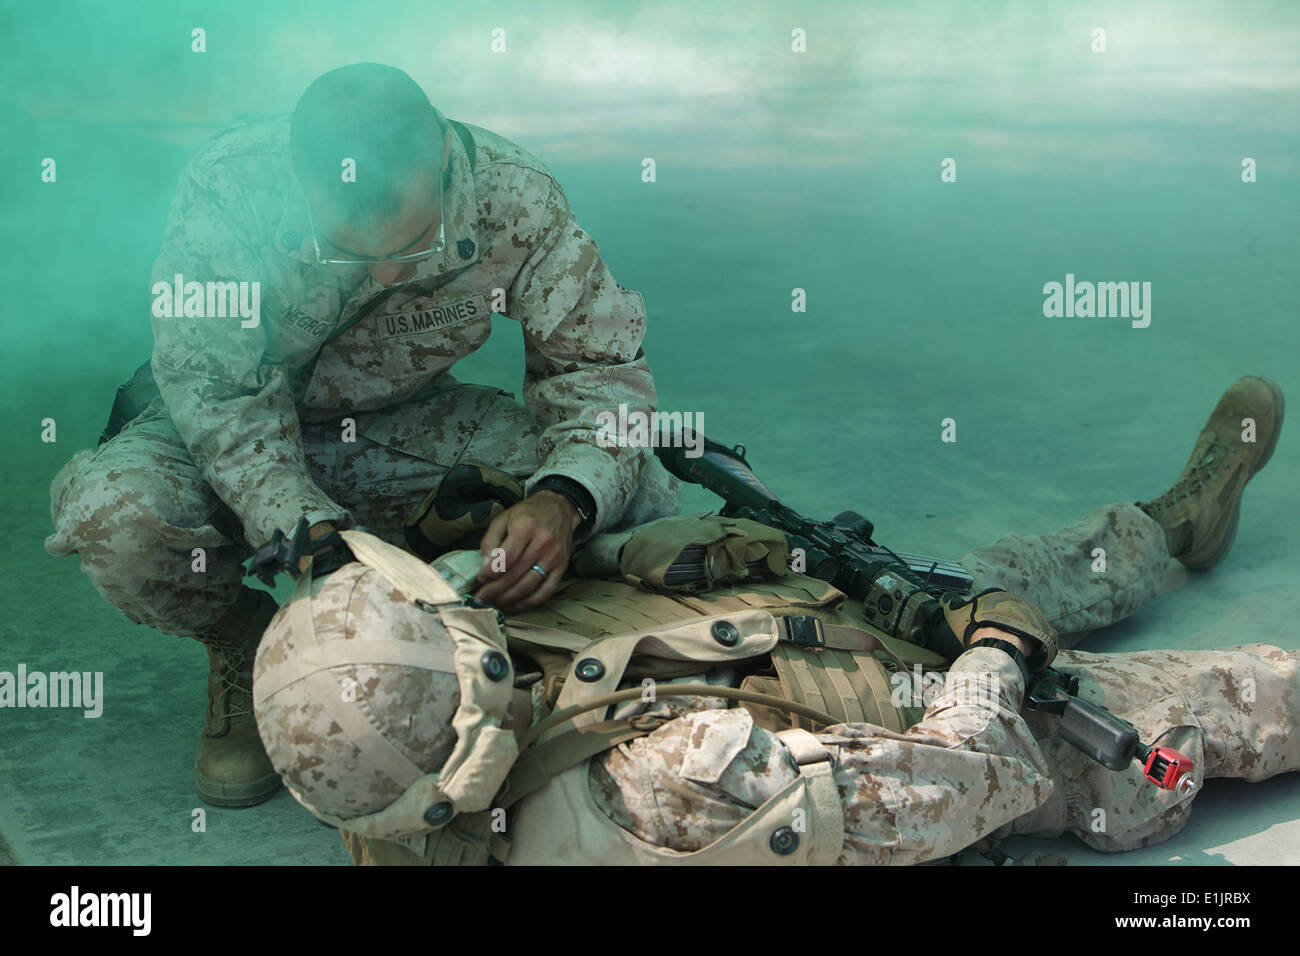 US Marine Corps Staff Sgt Alfred Negron II, mit Alpha Company, 7th Engineer Support Battalion, 1st Marine Logistics Stockbild